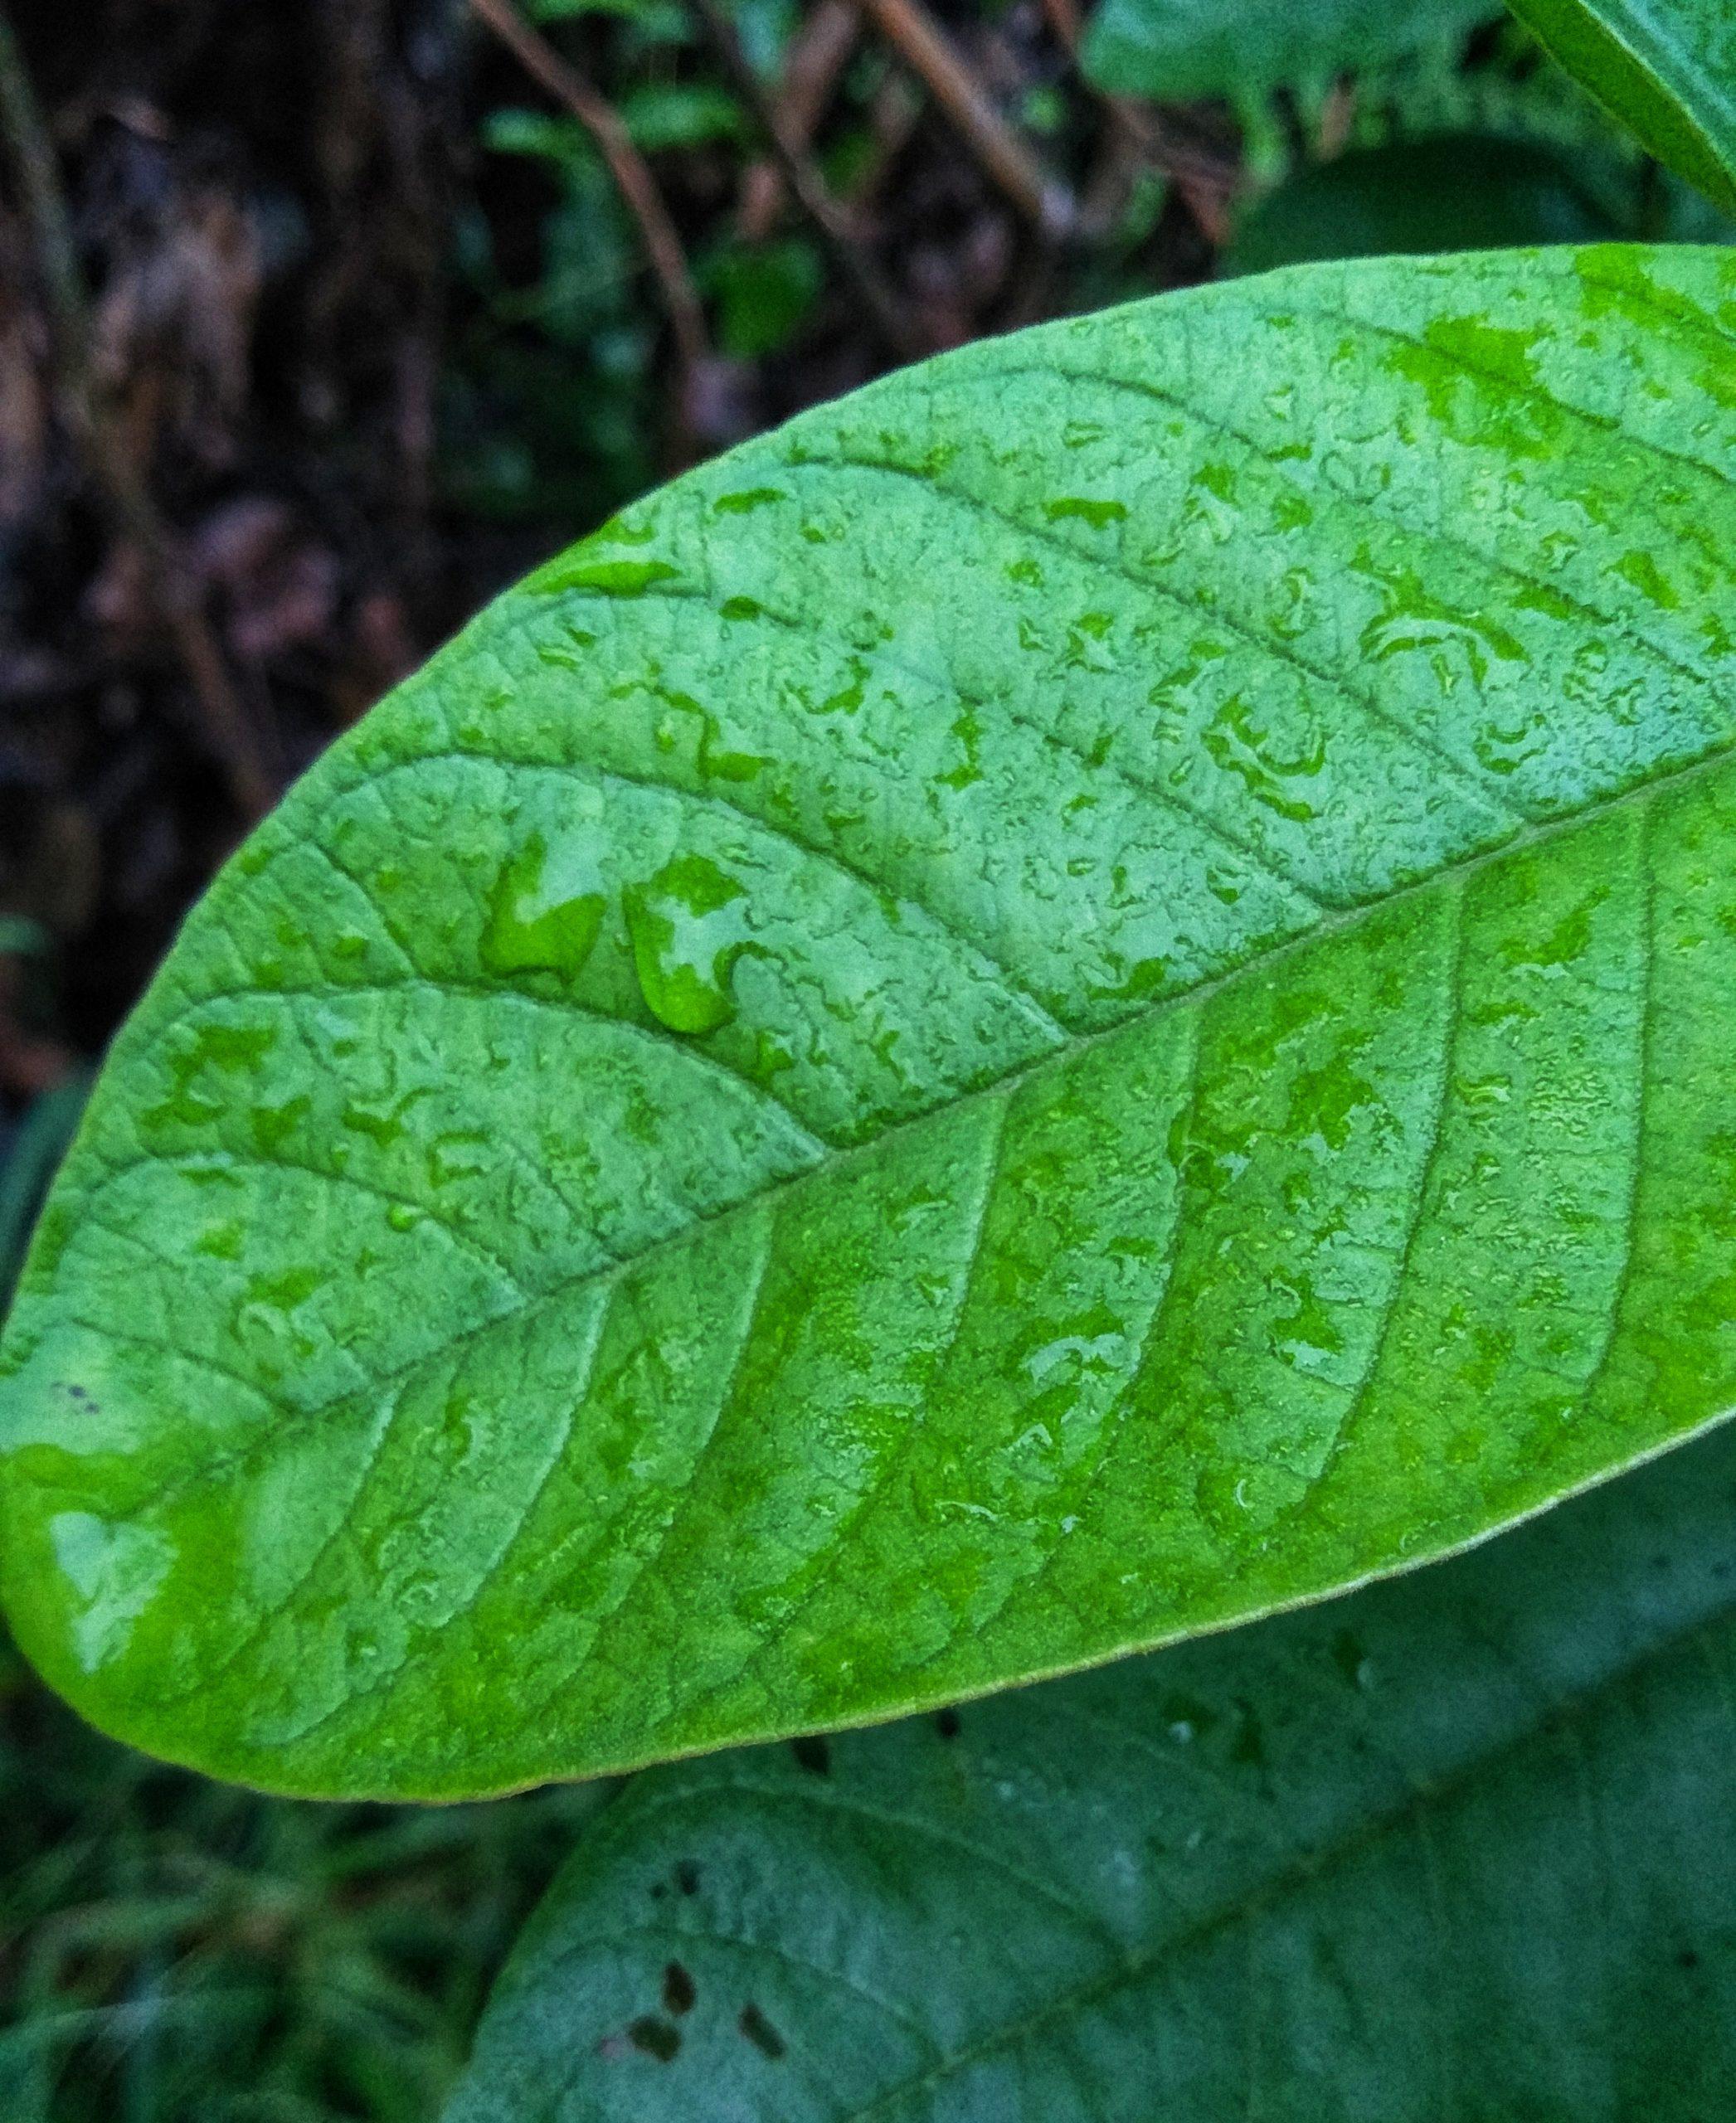 Guava tree leaf